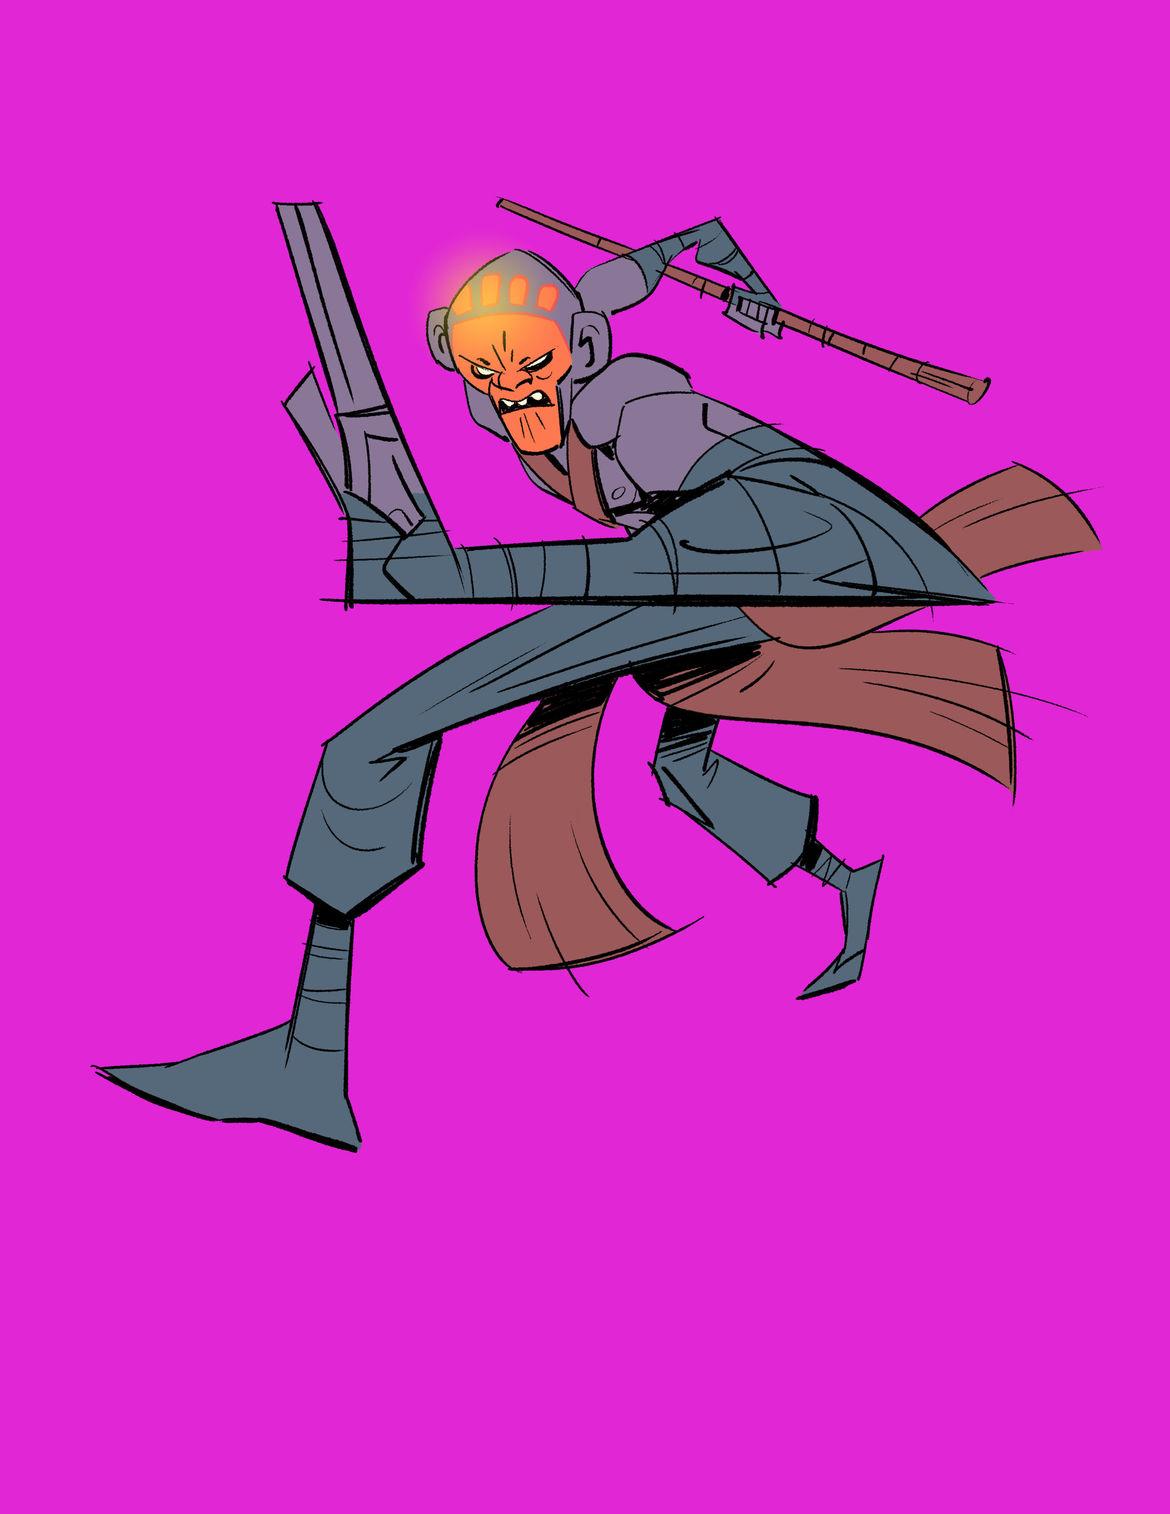 Exclusive: The creators of Rise of the Teenage Mutant Ninja